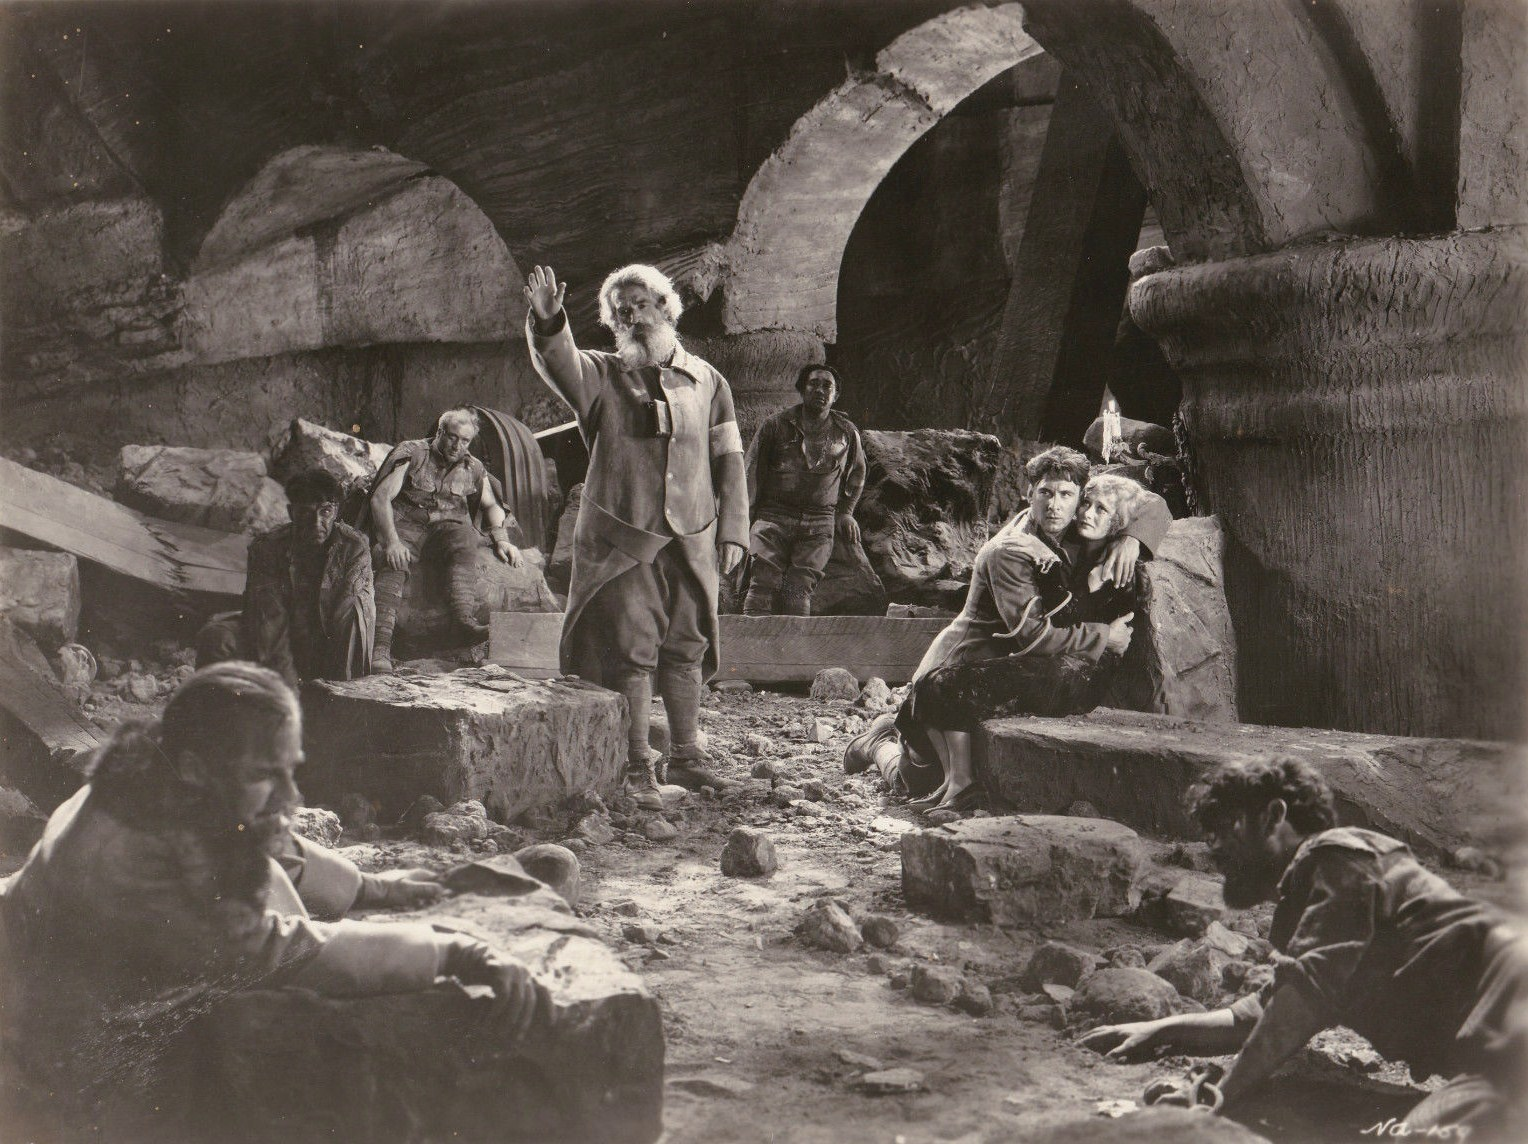 Noahs Ark 1928 still 2 Dangerous Movie Production Moments That Could Never Happen Today